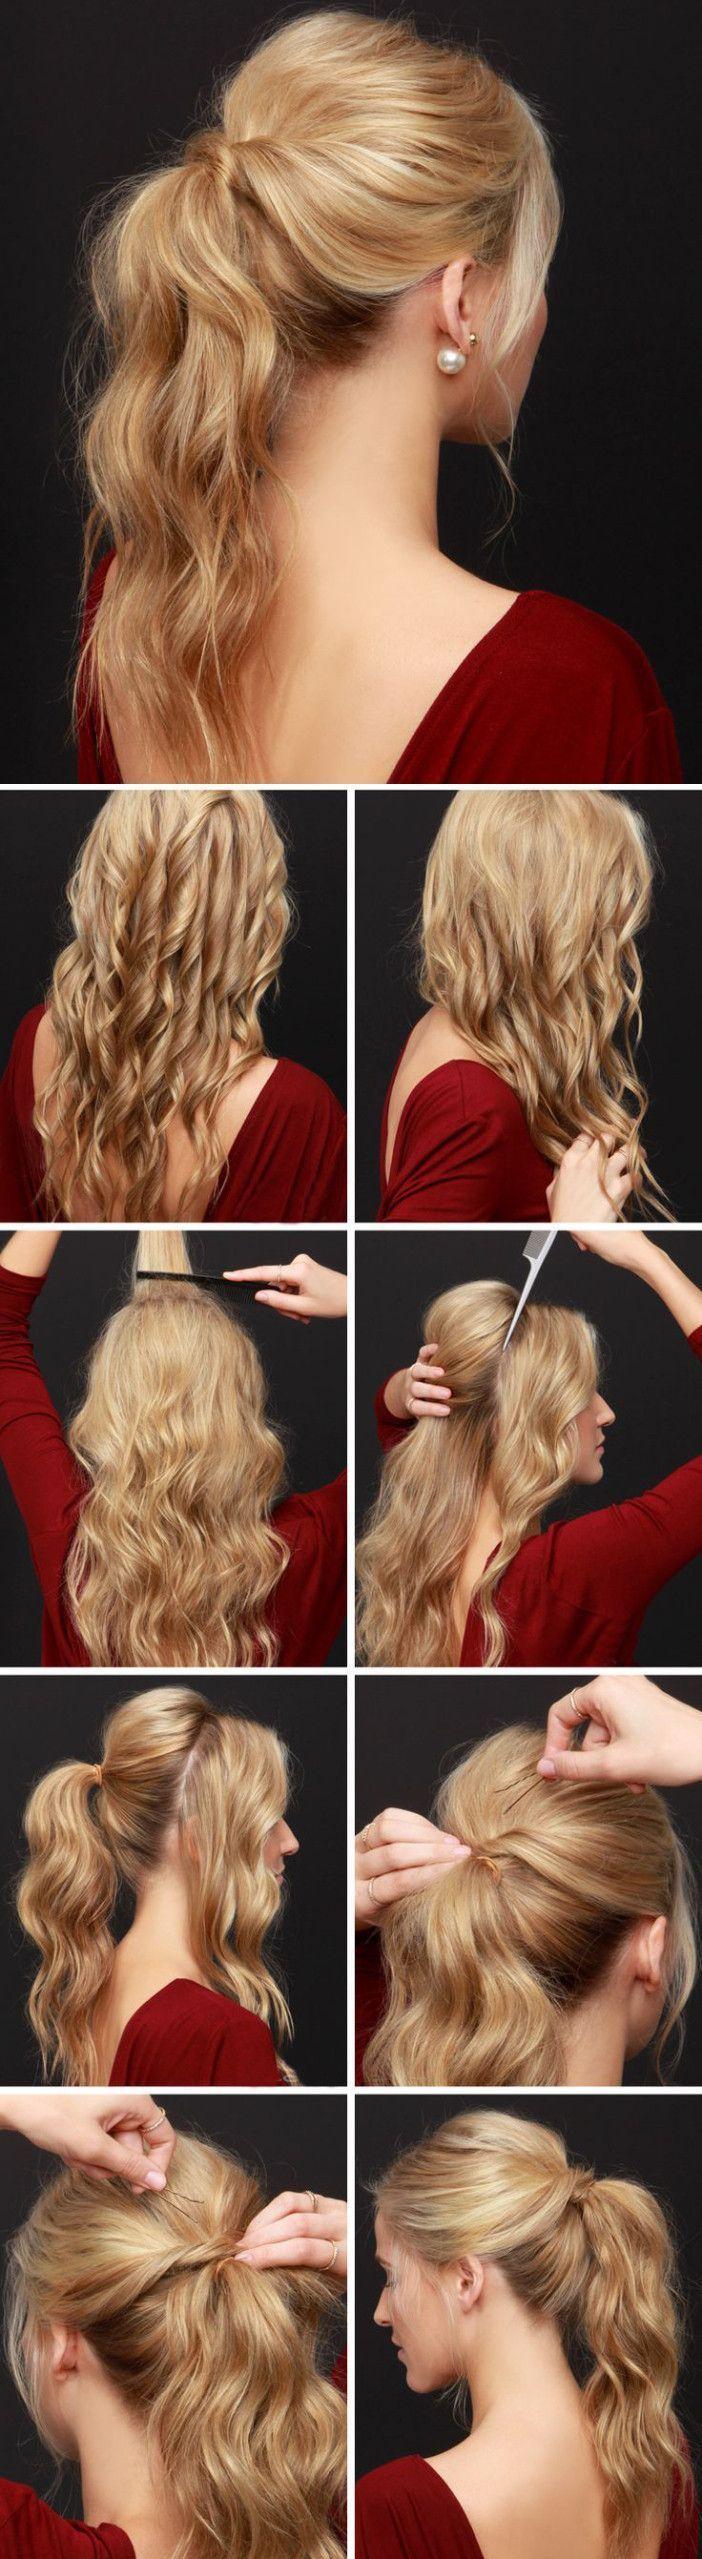 Gorgeous party ponytail diyhairstyles diy hairstyles pinterest